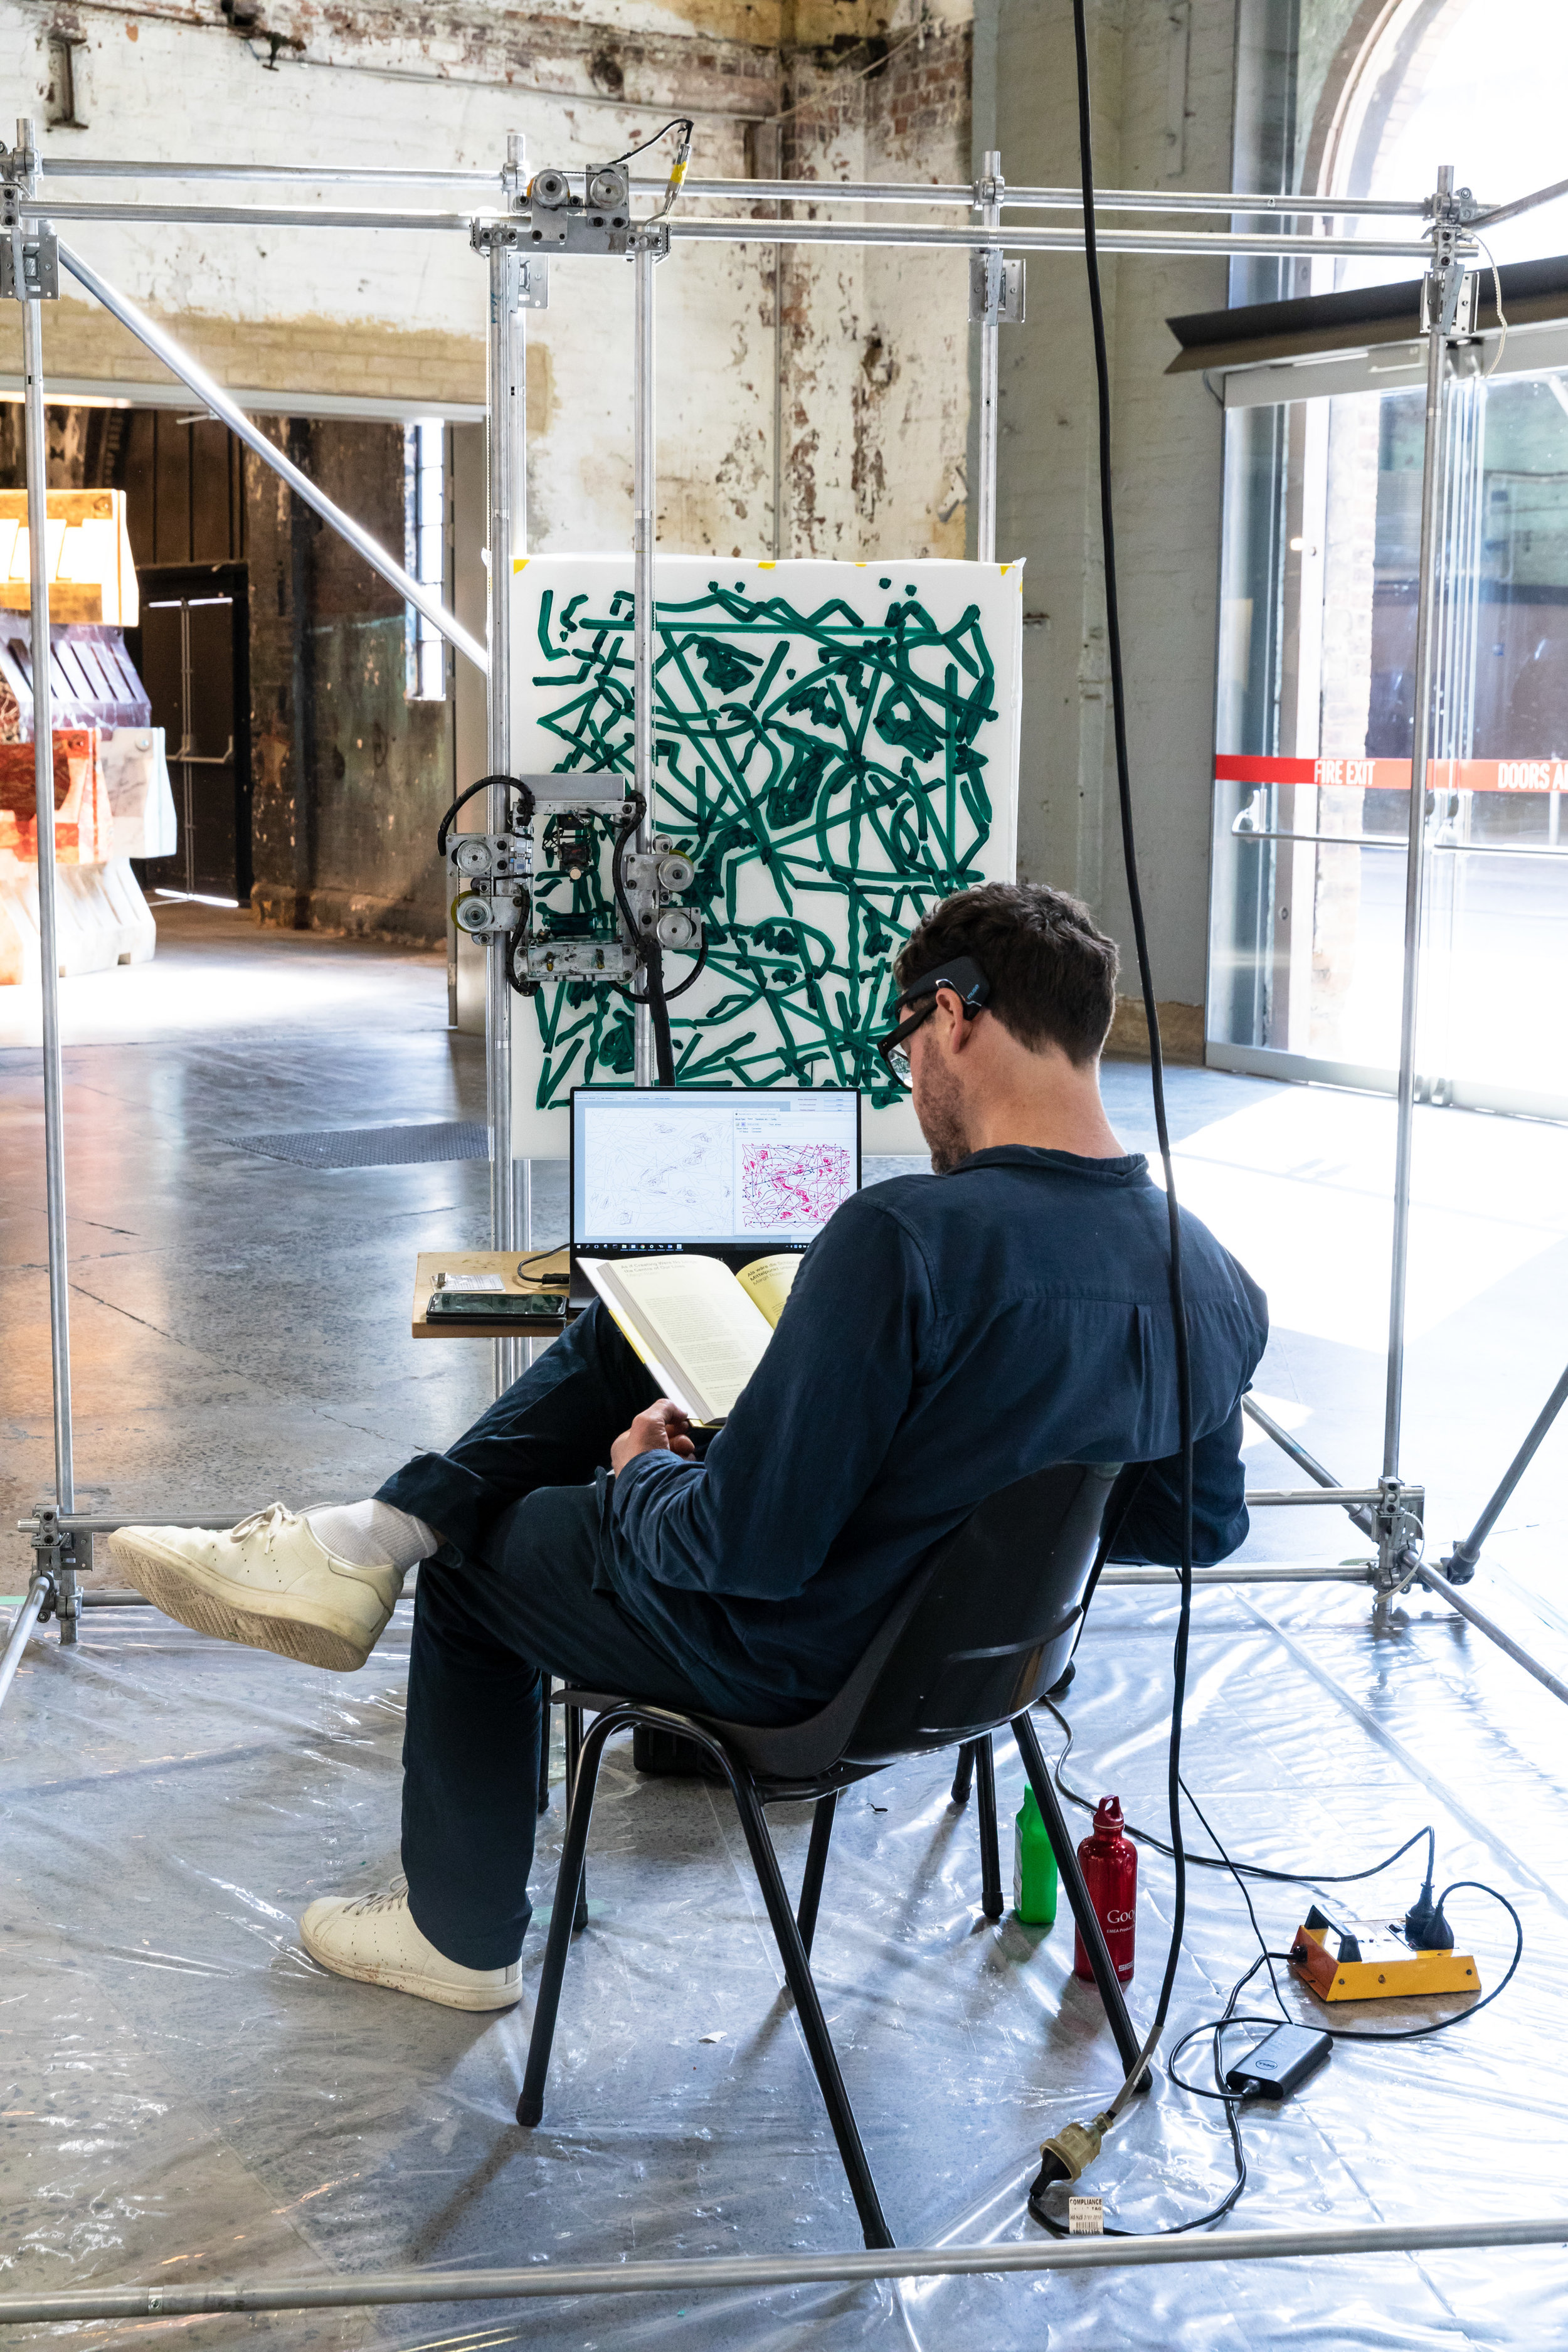 Monadic Device, Sydney Contemporary, Sydney, 2018